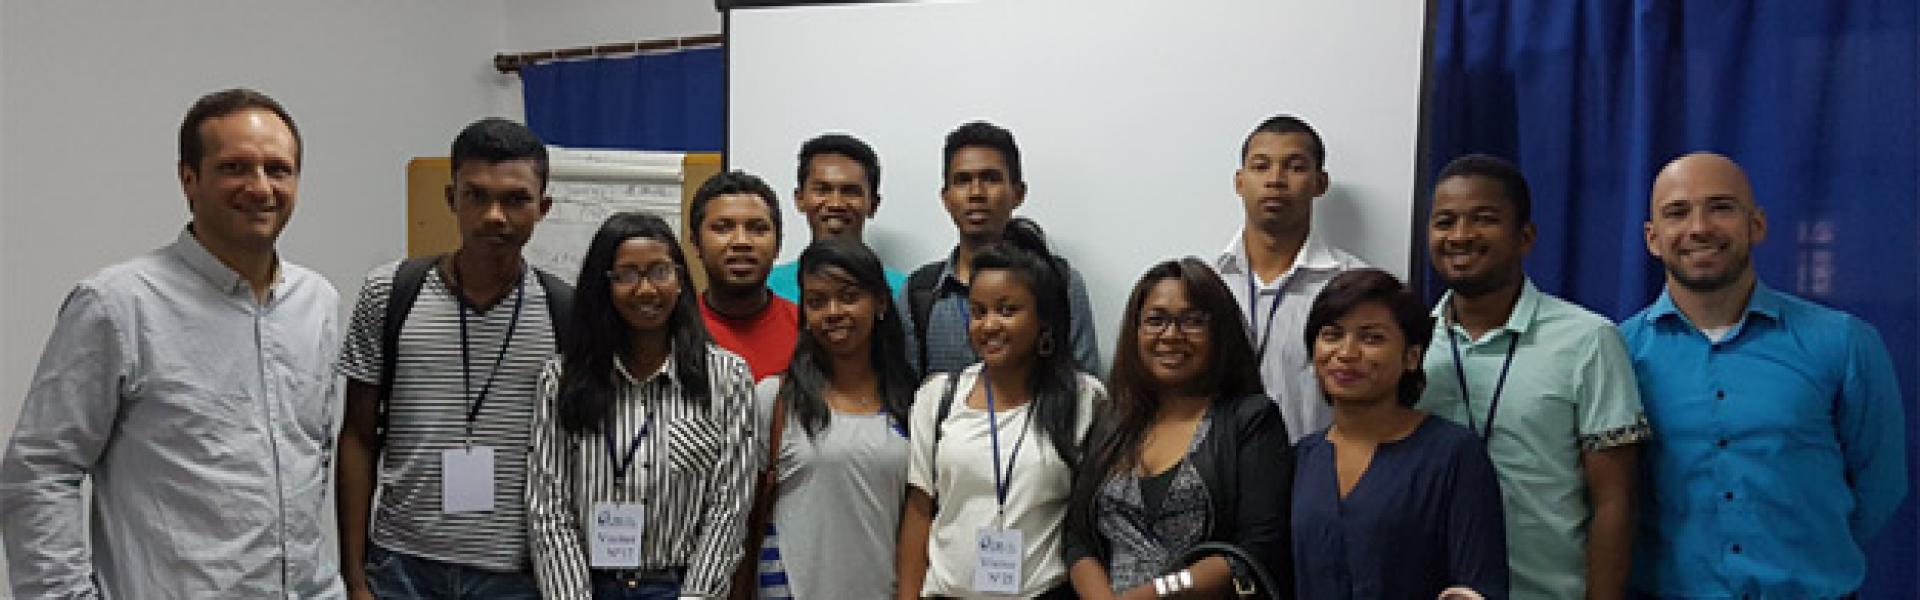 Cooperative Leadership Event in Madagascar